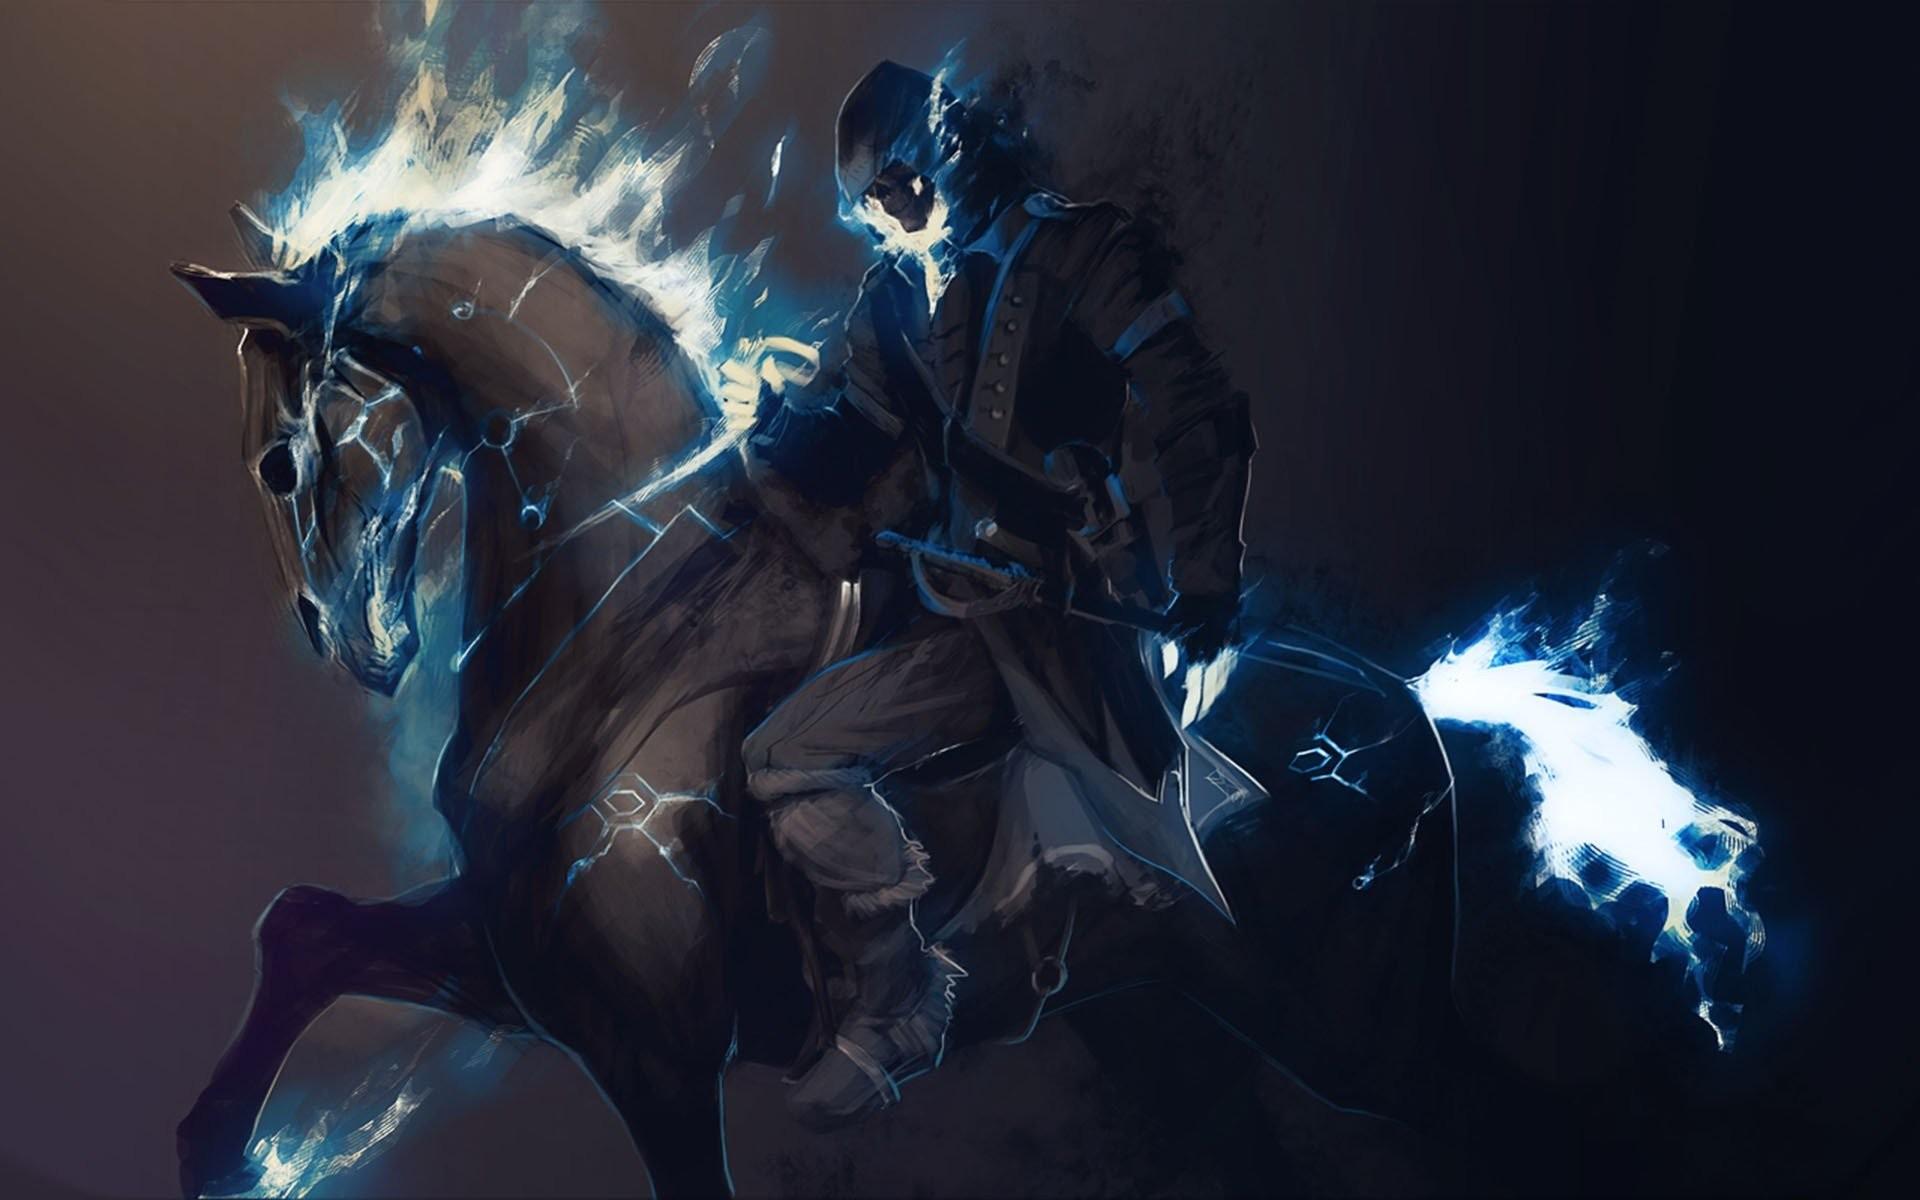 Dark Art Artwork Fantasy Artistic Original Psychedelic Ghost